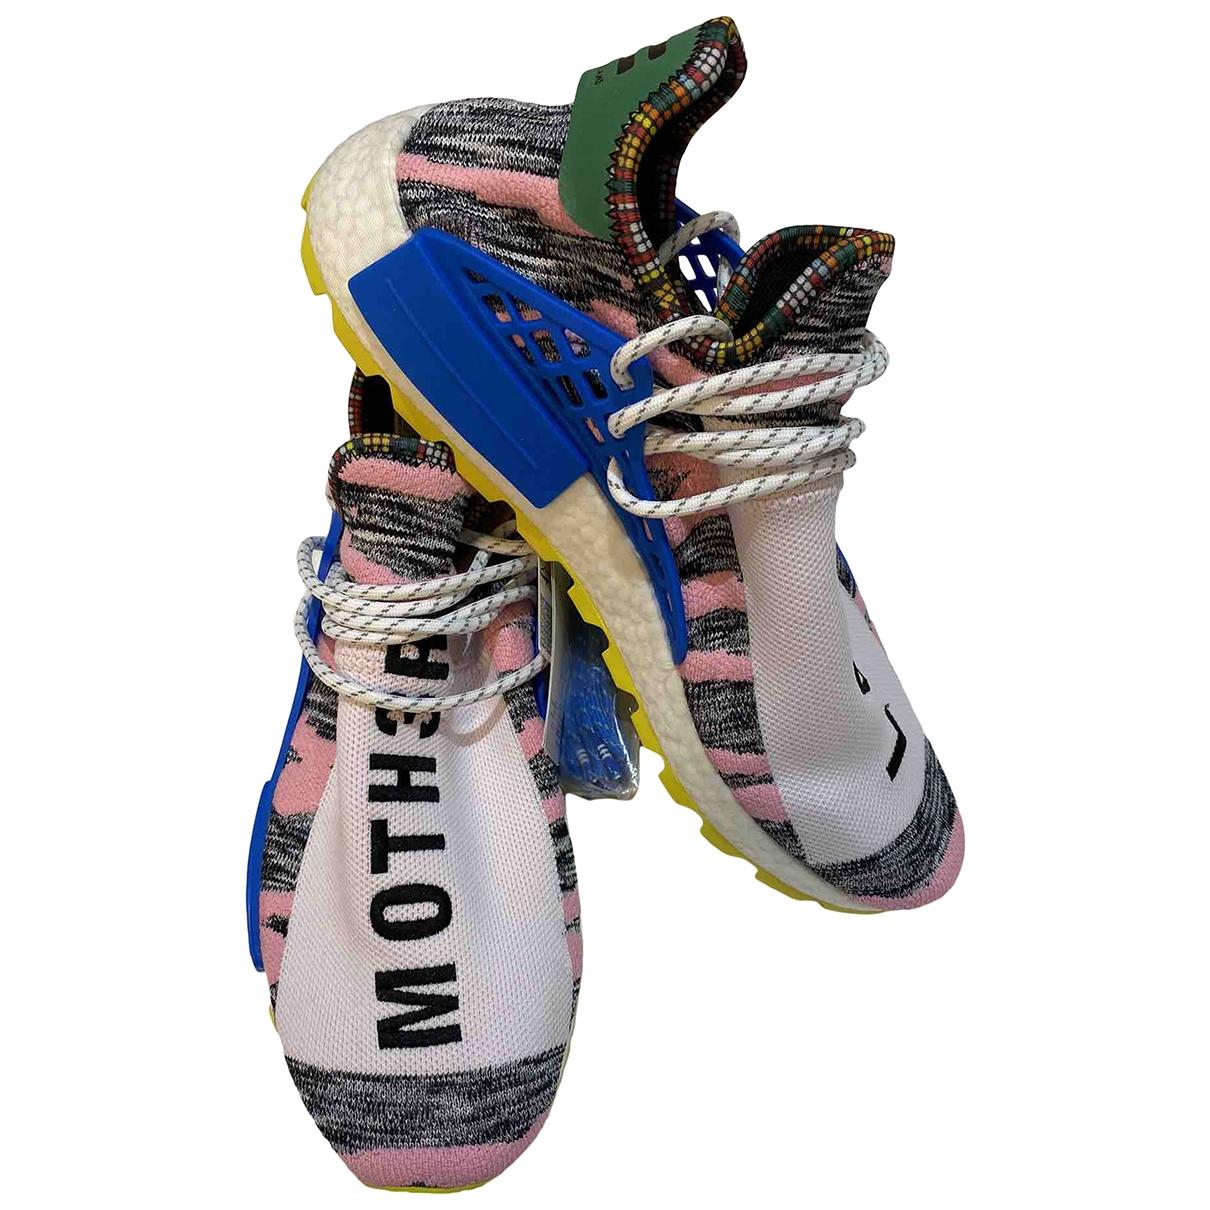 Adidas X Pharrell Williams NMD Hu Sneakers in Leinen